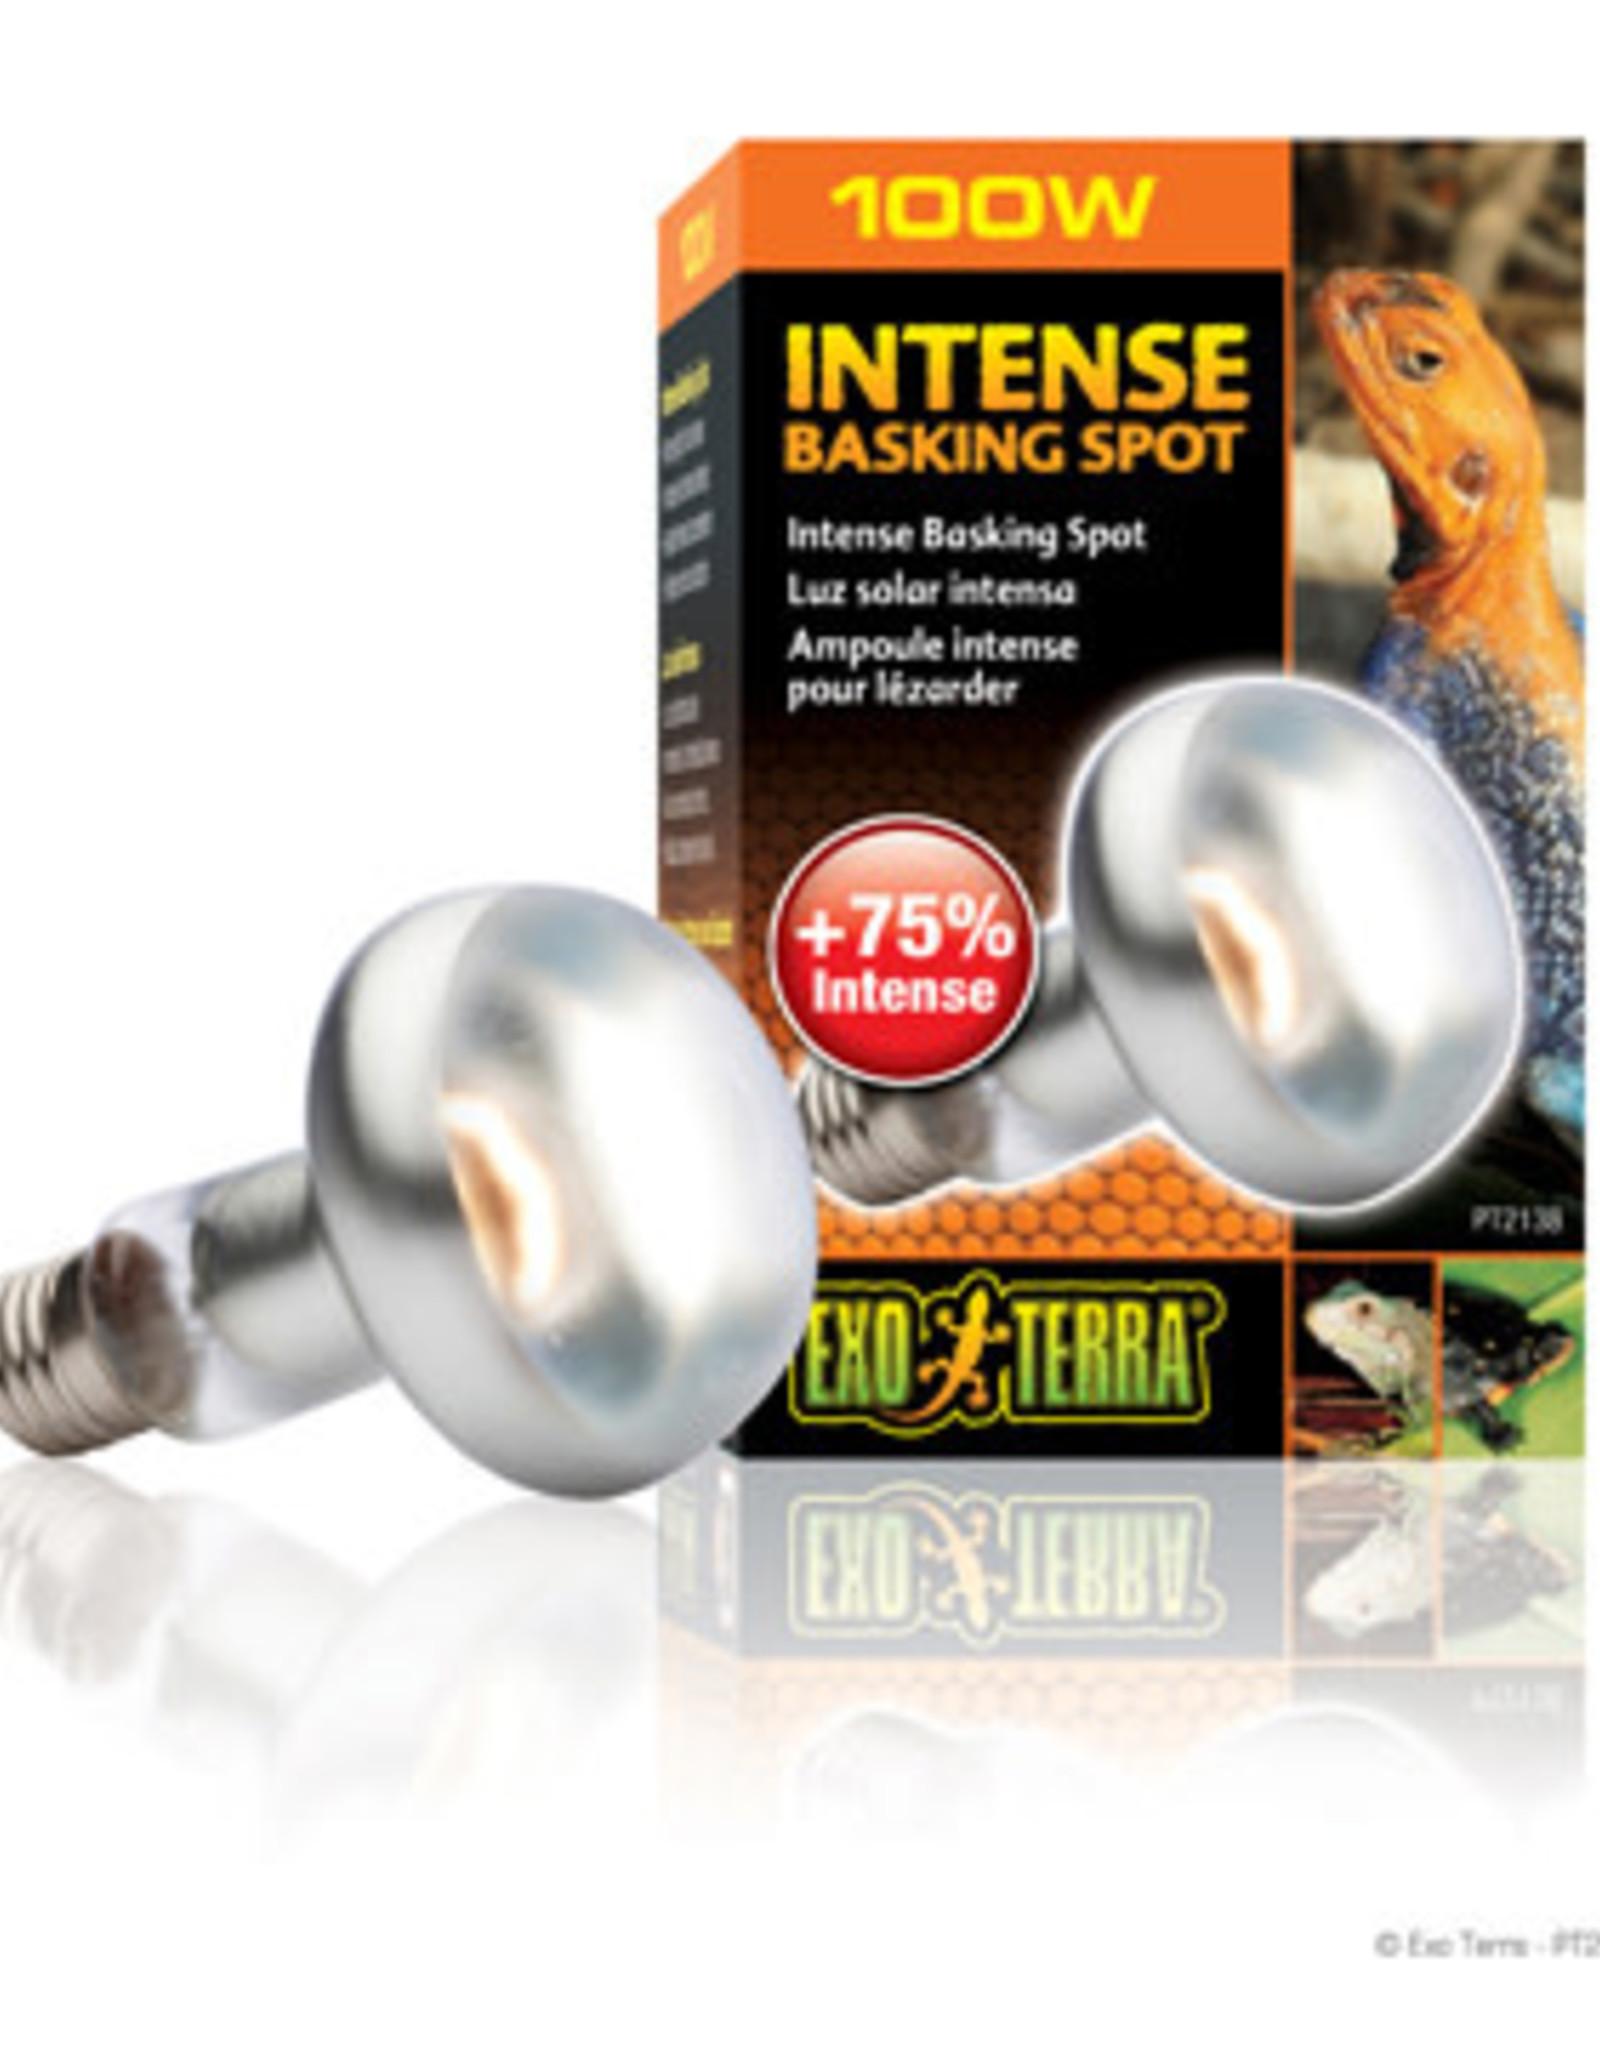 EXO-TERRA Exo Terra Intense Basking Spot Lamp, 100W